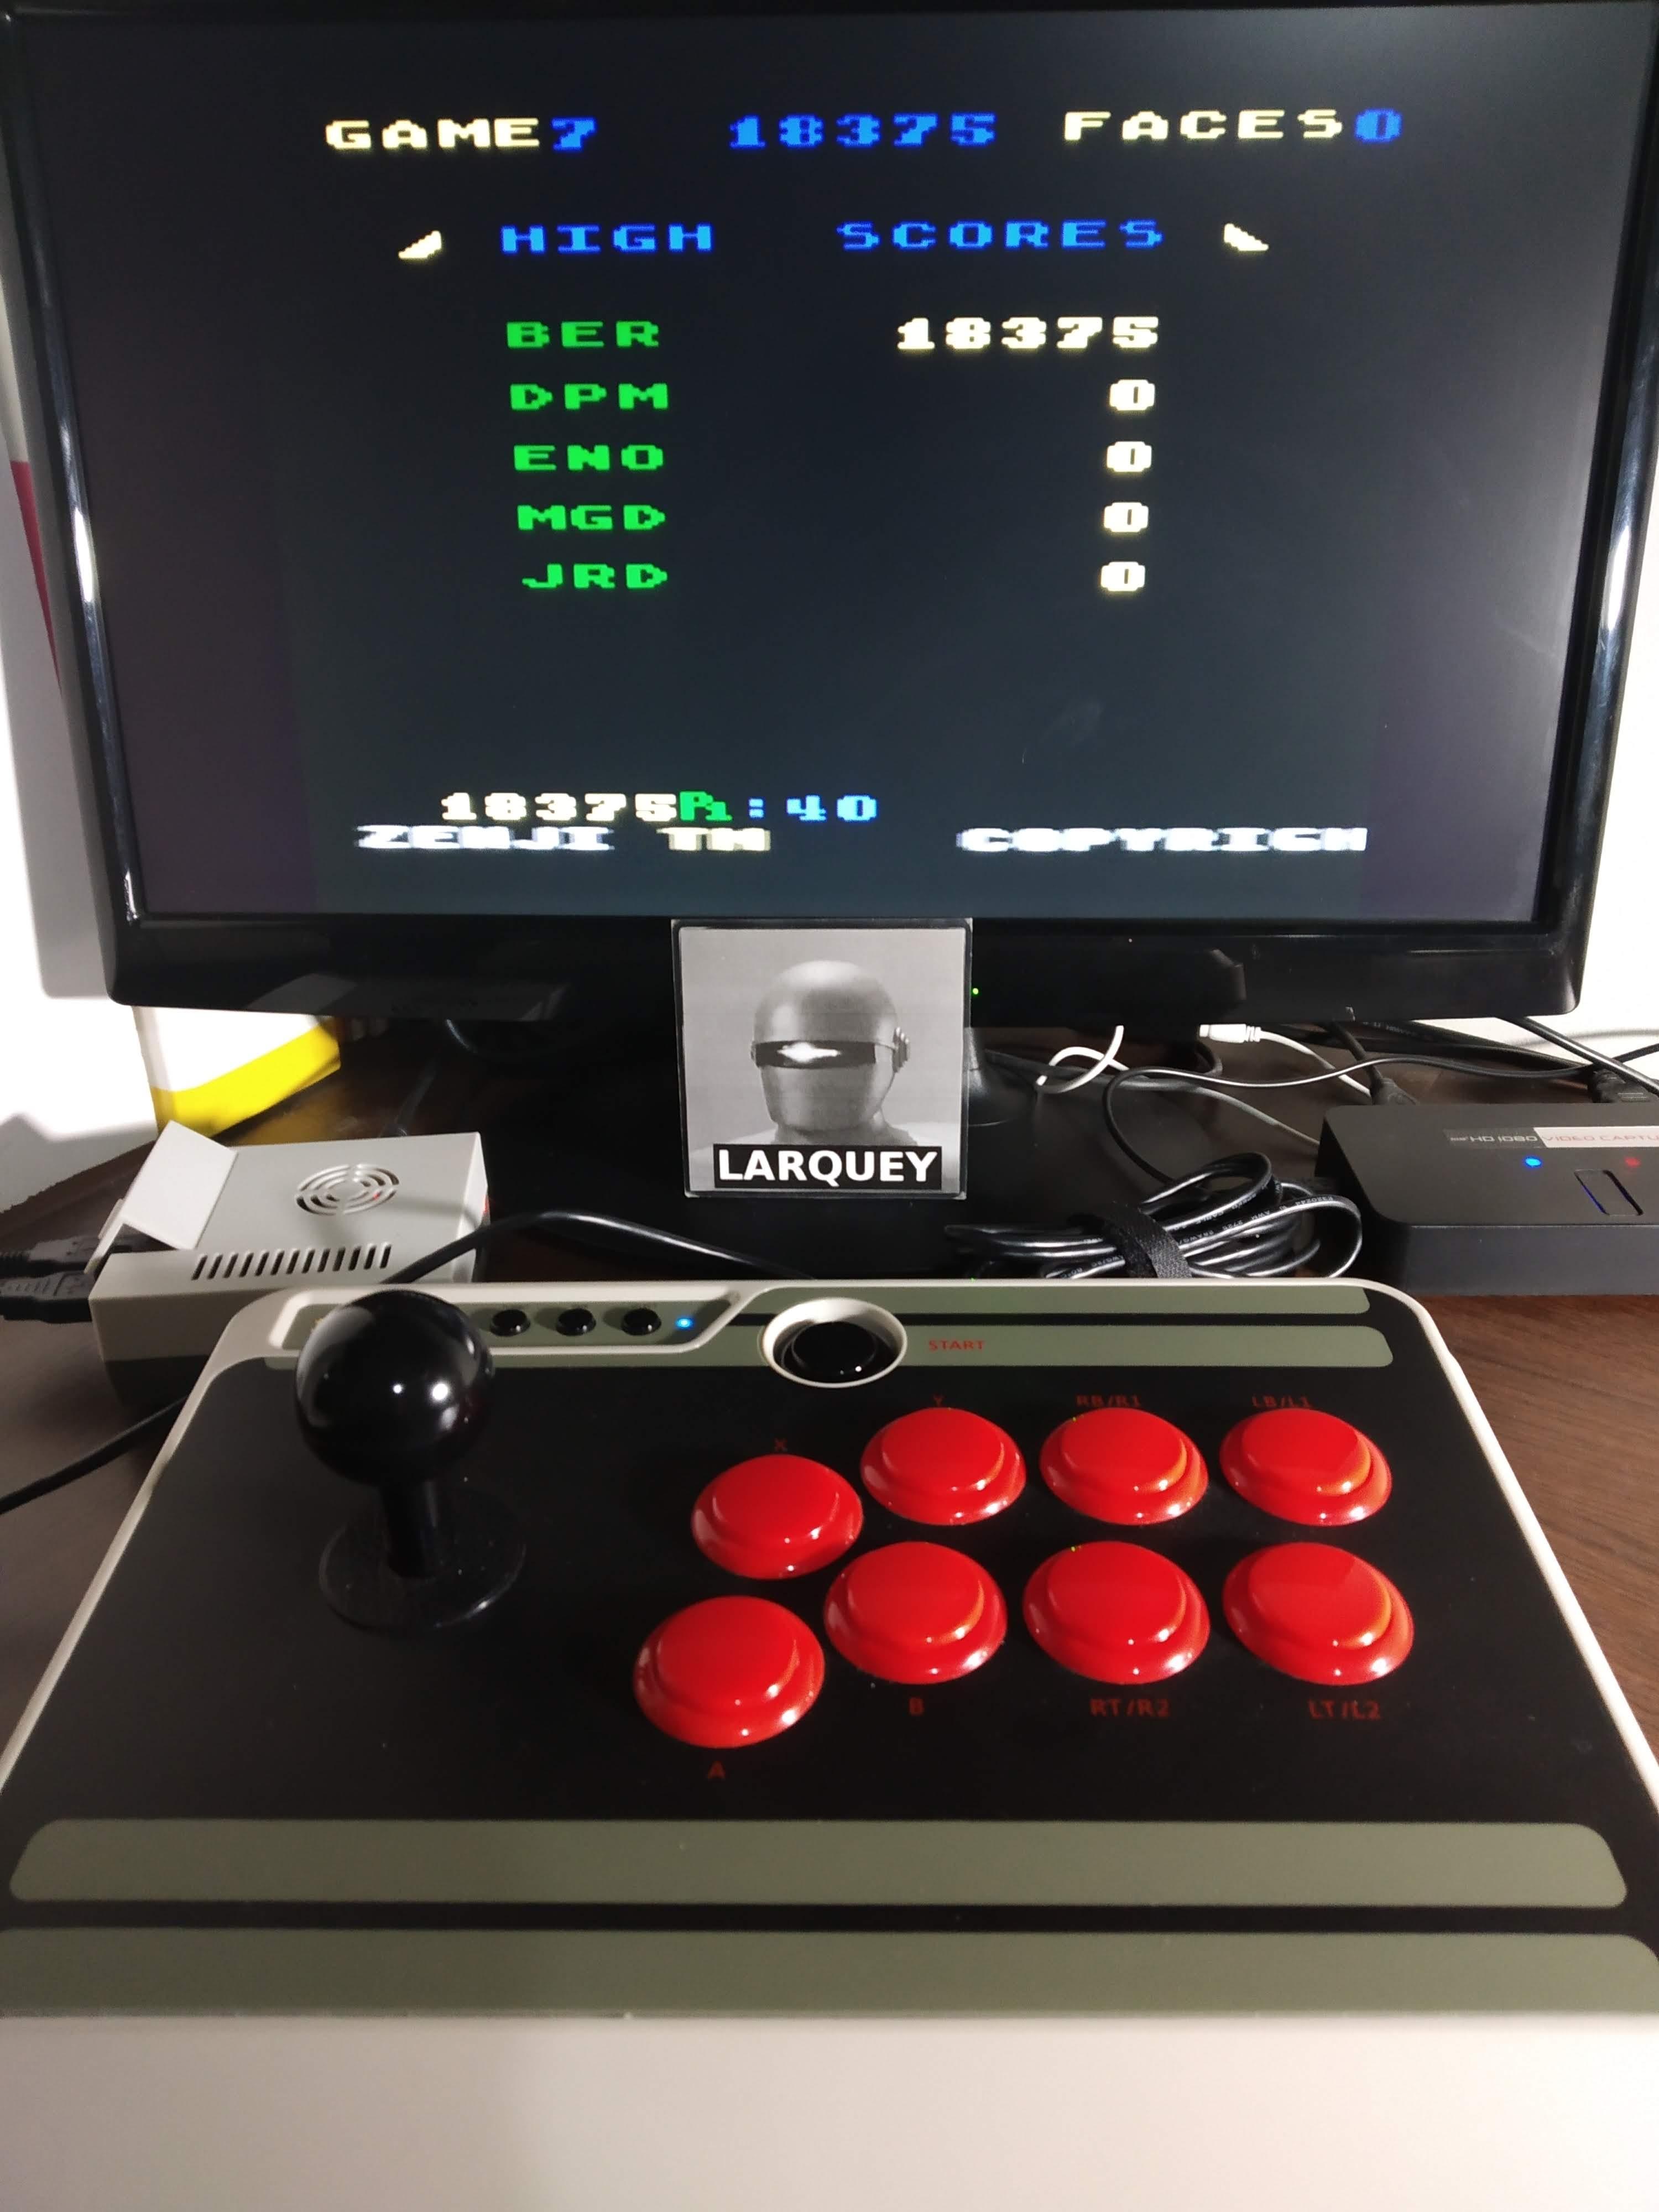 Larquey: Zenji: Game 7 (Atari 5200 Emulated) 18,375 points on 2019-11-13 13:14:22